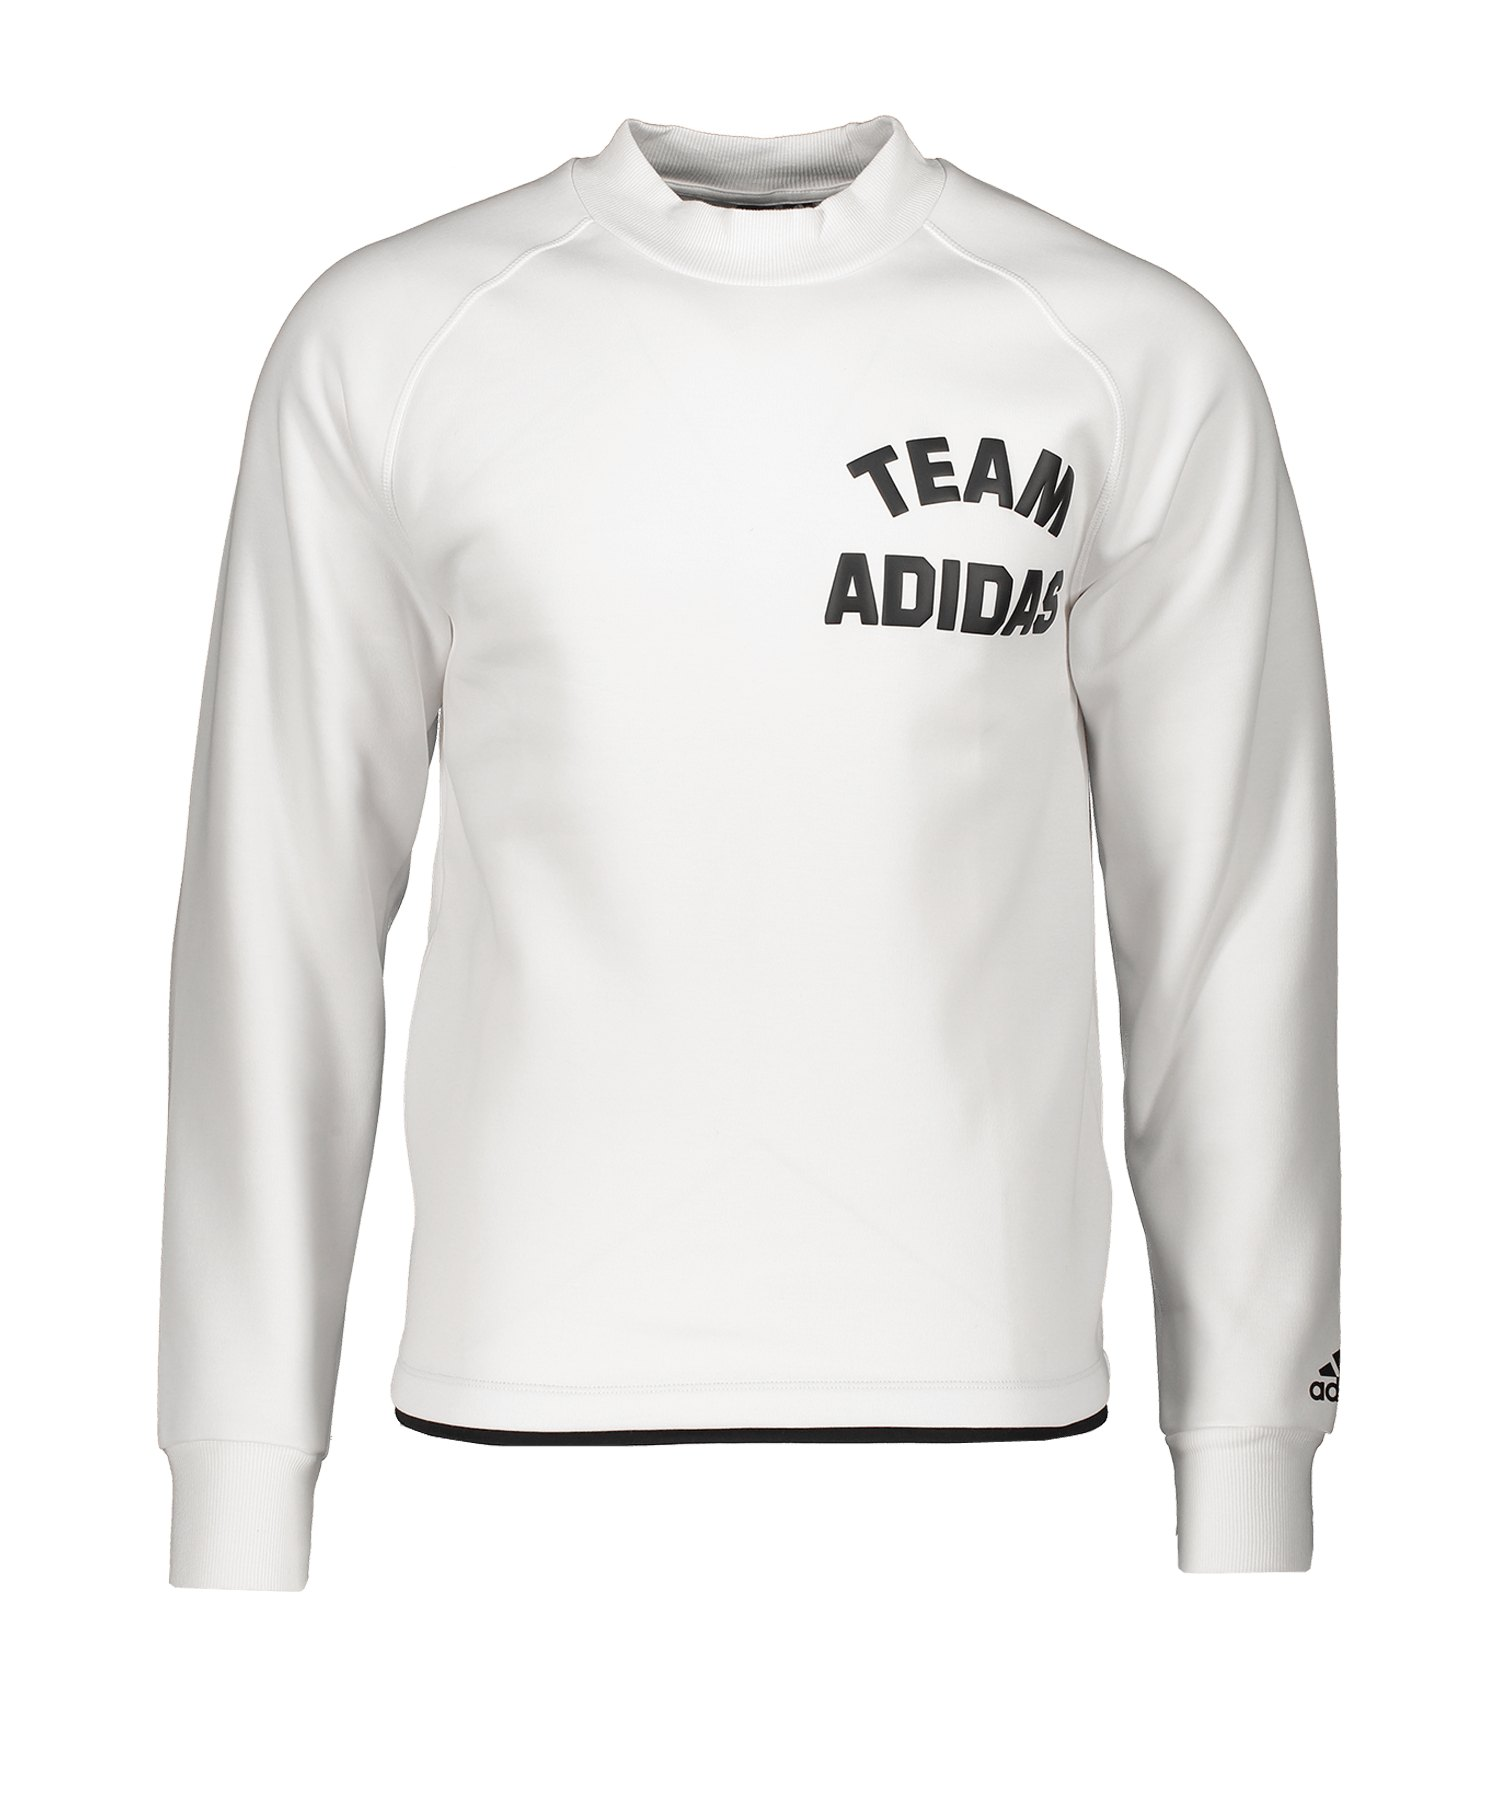 adidas VRCT Crew Sweatshirt langarm Weiss - weiss